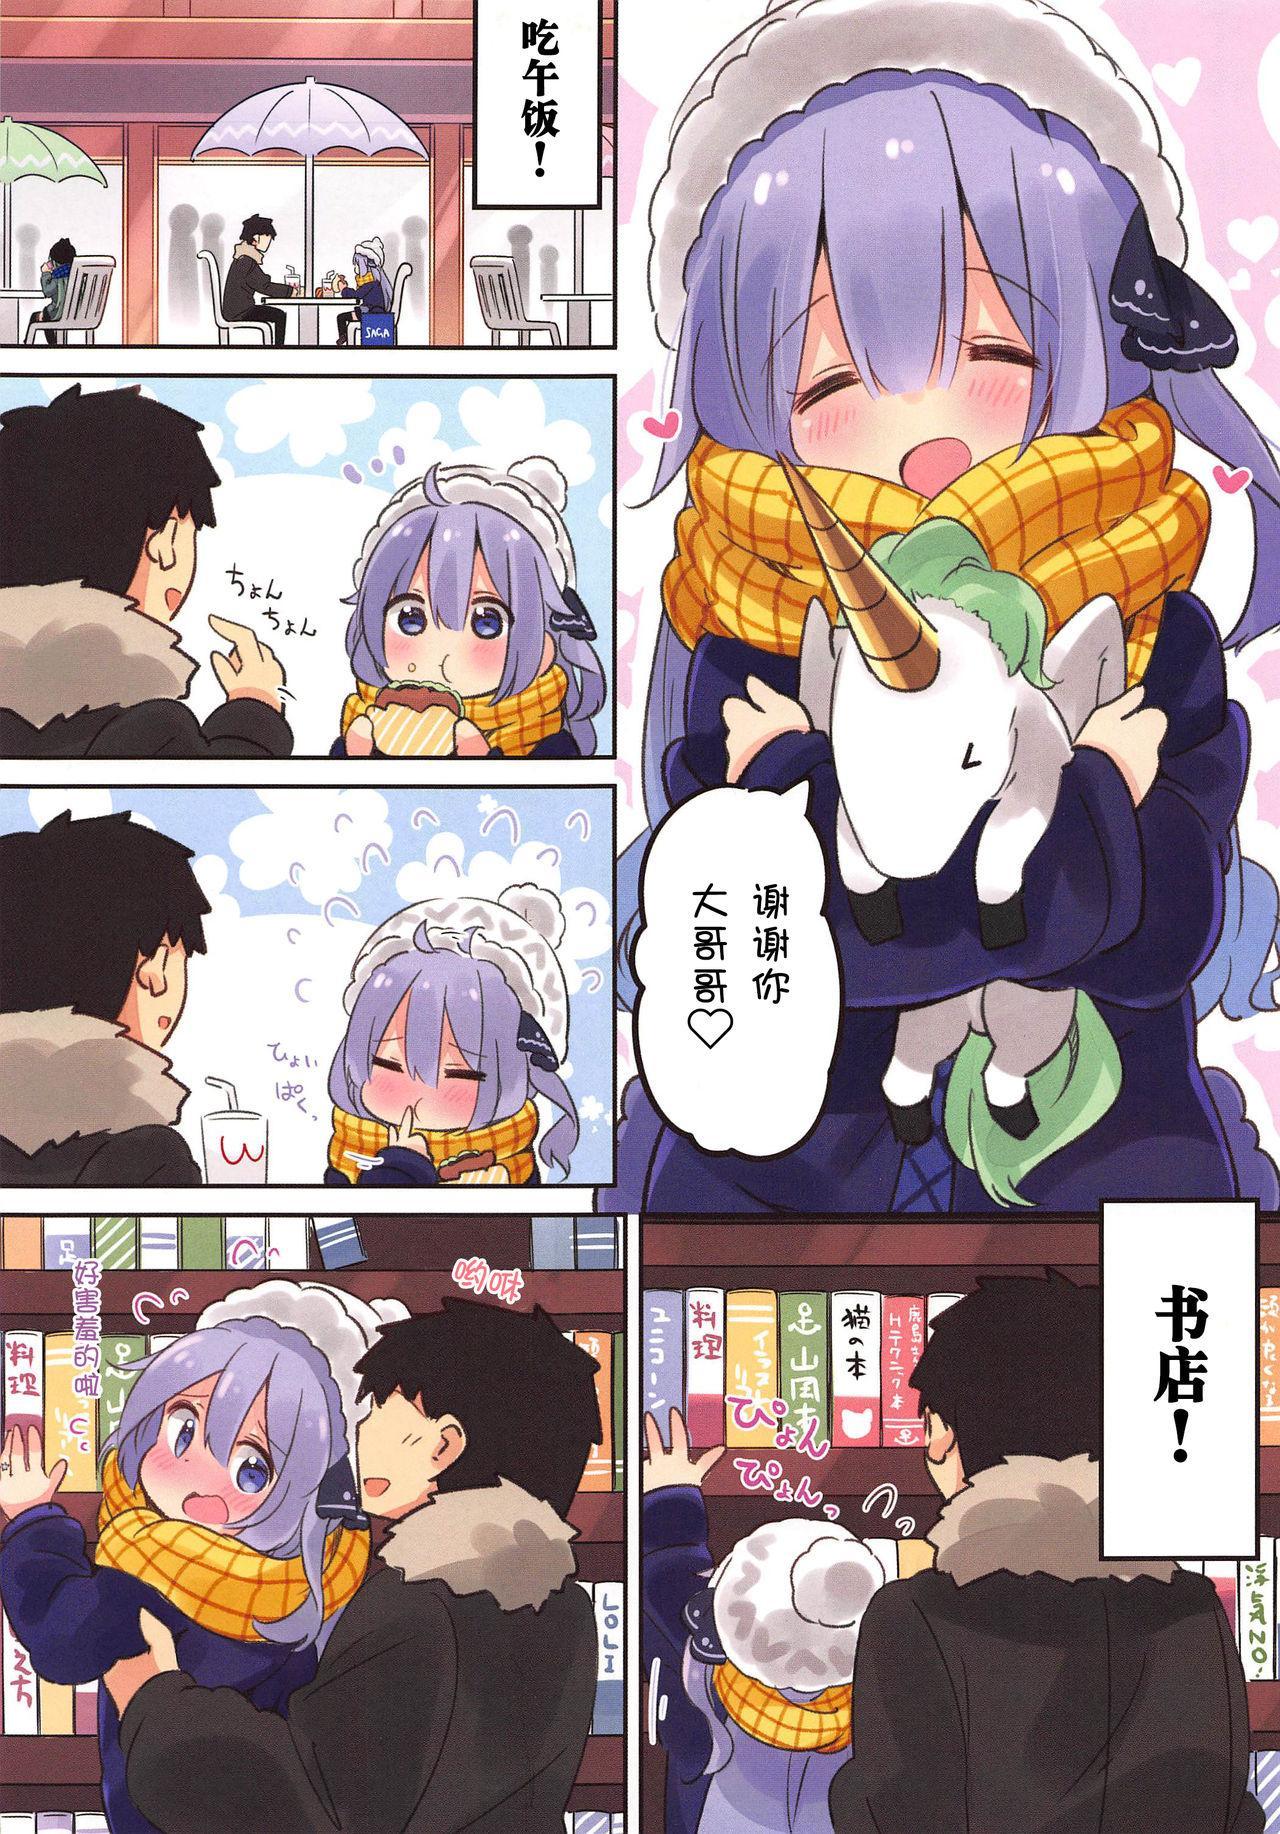 (COMIC1☆16) [Toto-taste (Suzuki Toto)] Papa wa (Onii-chan wa) Watasanai (Kantai Collection -KanColle-, Azur Lane) [Chinese] [钢华团汉化组] 3